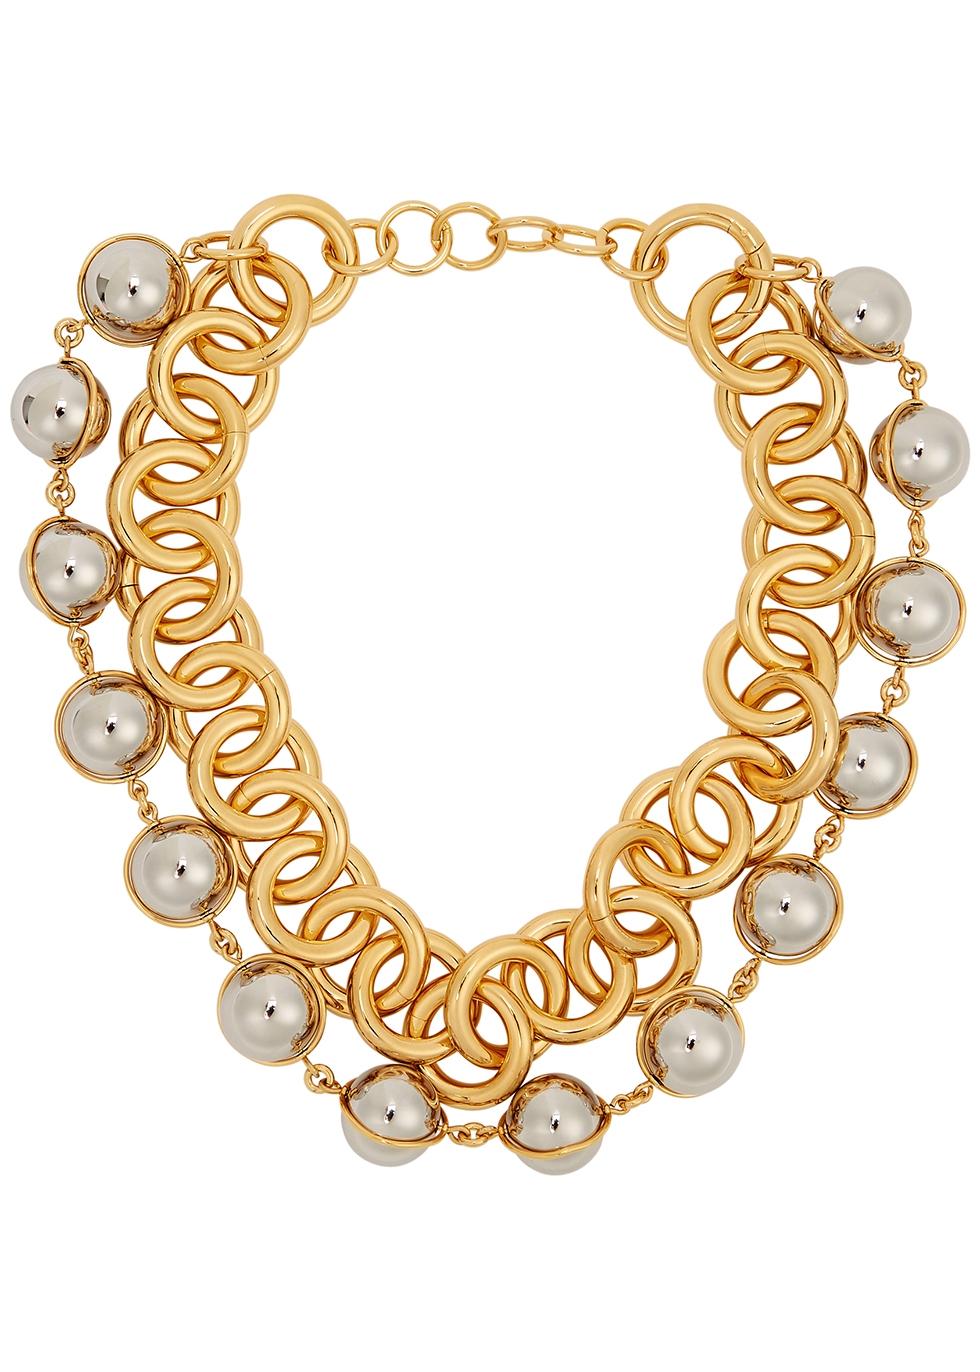 Pure gold-tone chain choker necklace